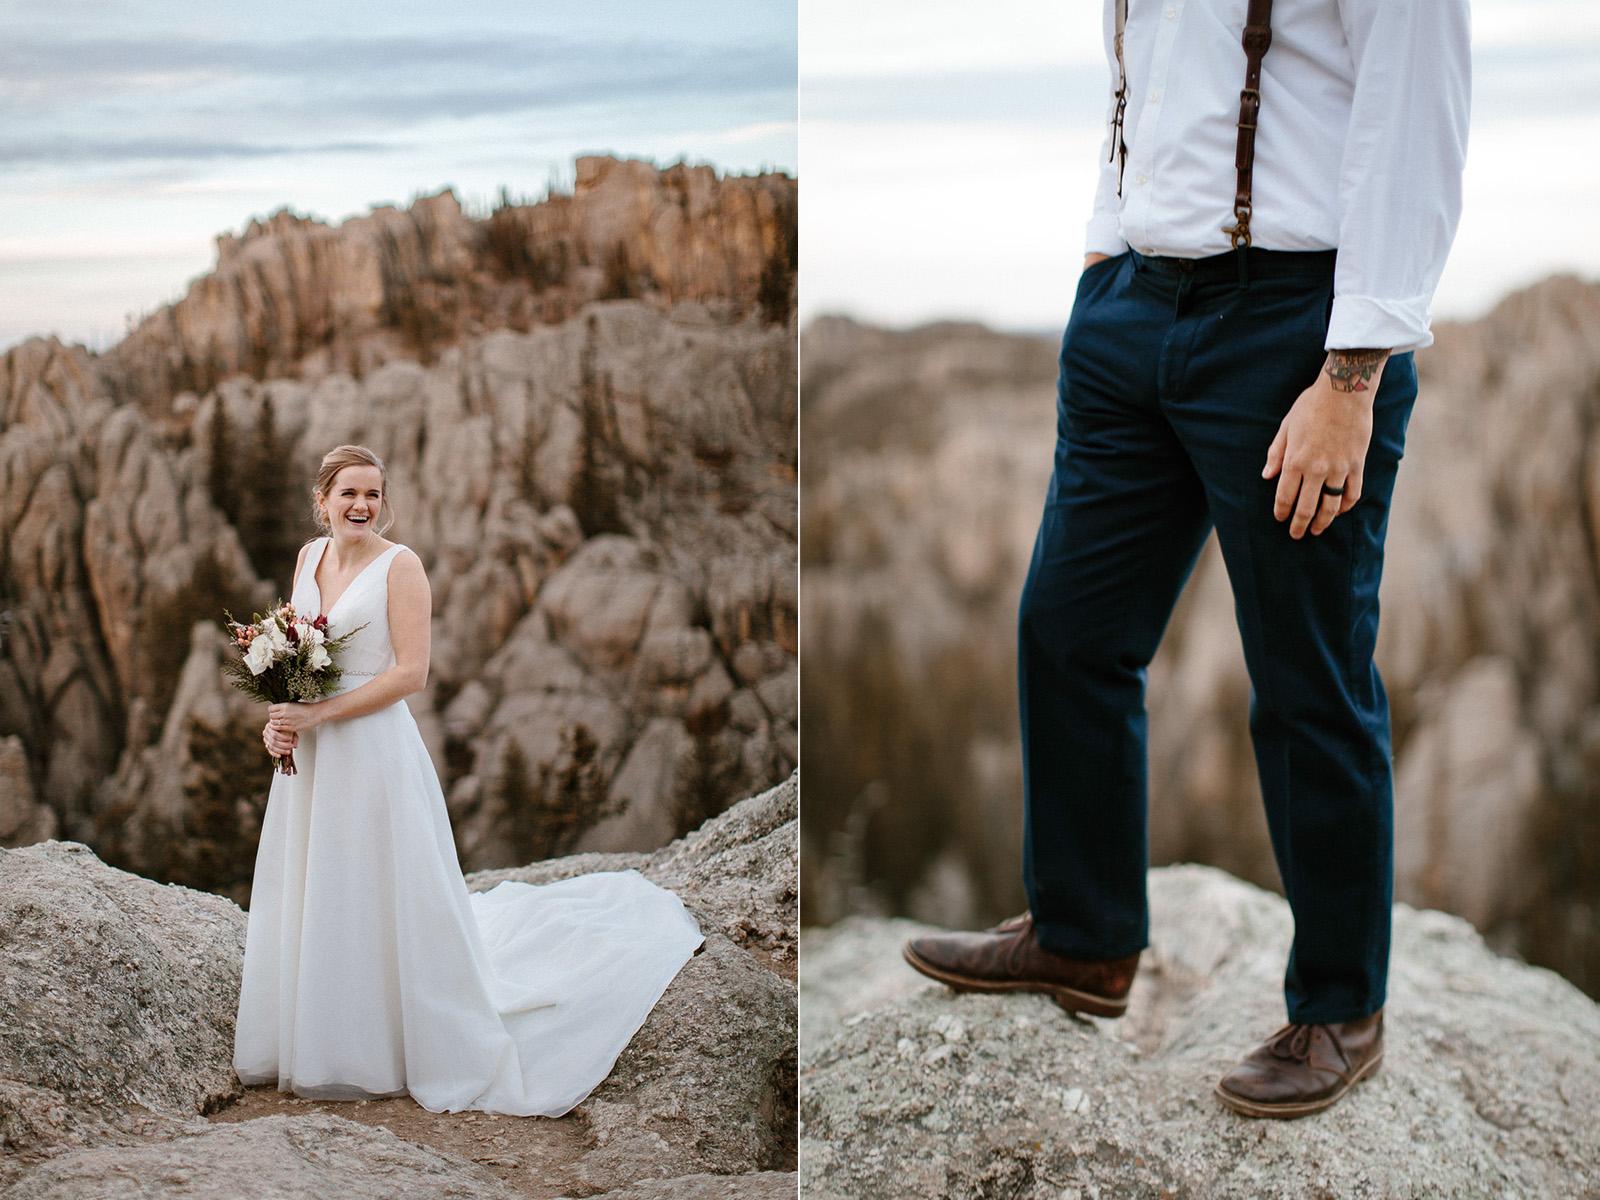 sioux-falls-black-hills-rapid-city-elopement-wedding-adventure-photographer-custer-sylvan-lake-54.jpg